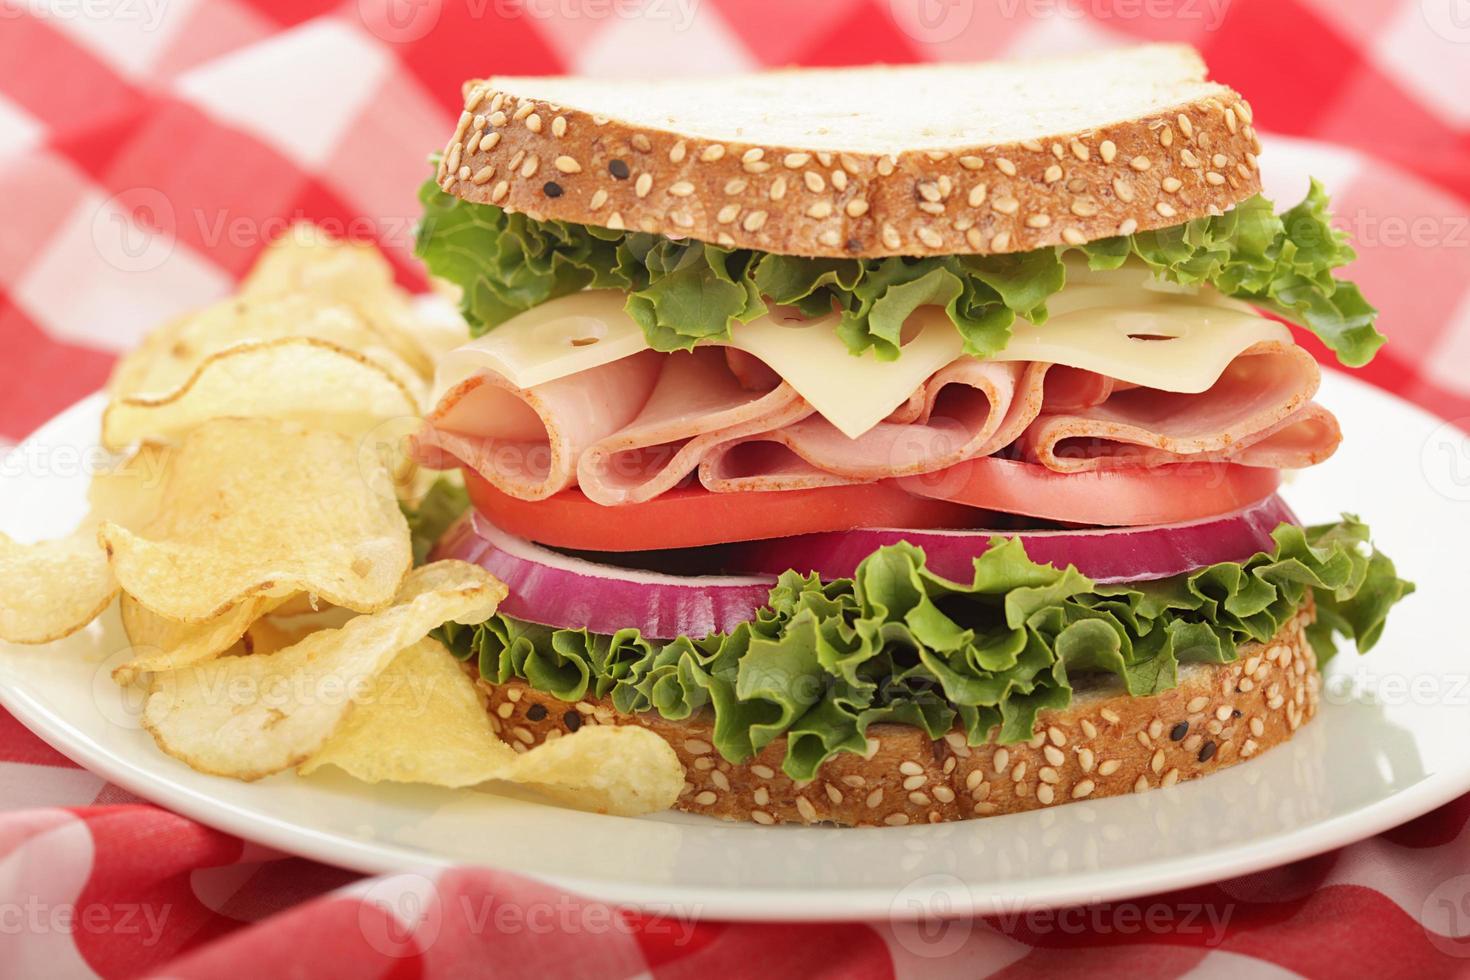 Sandwich perfection photo